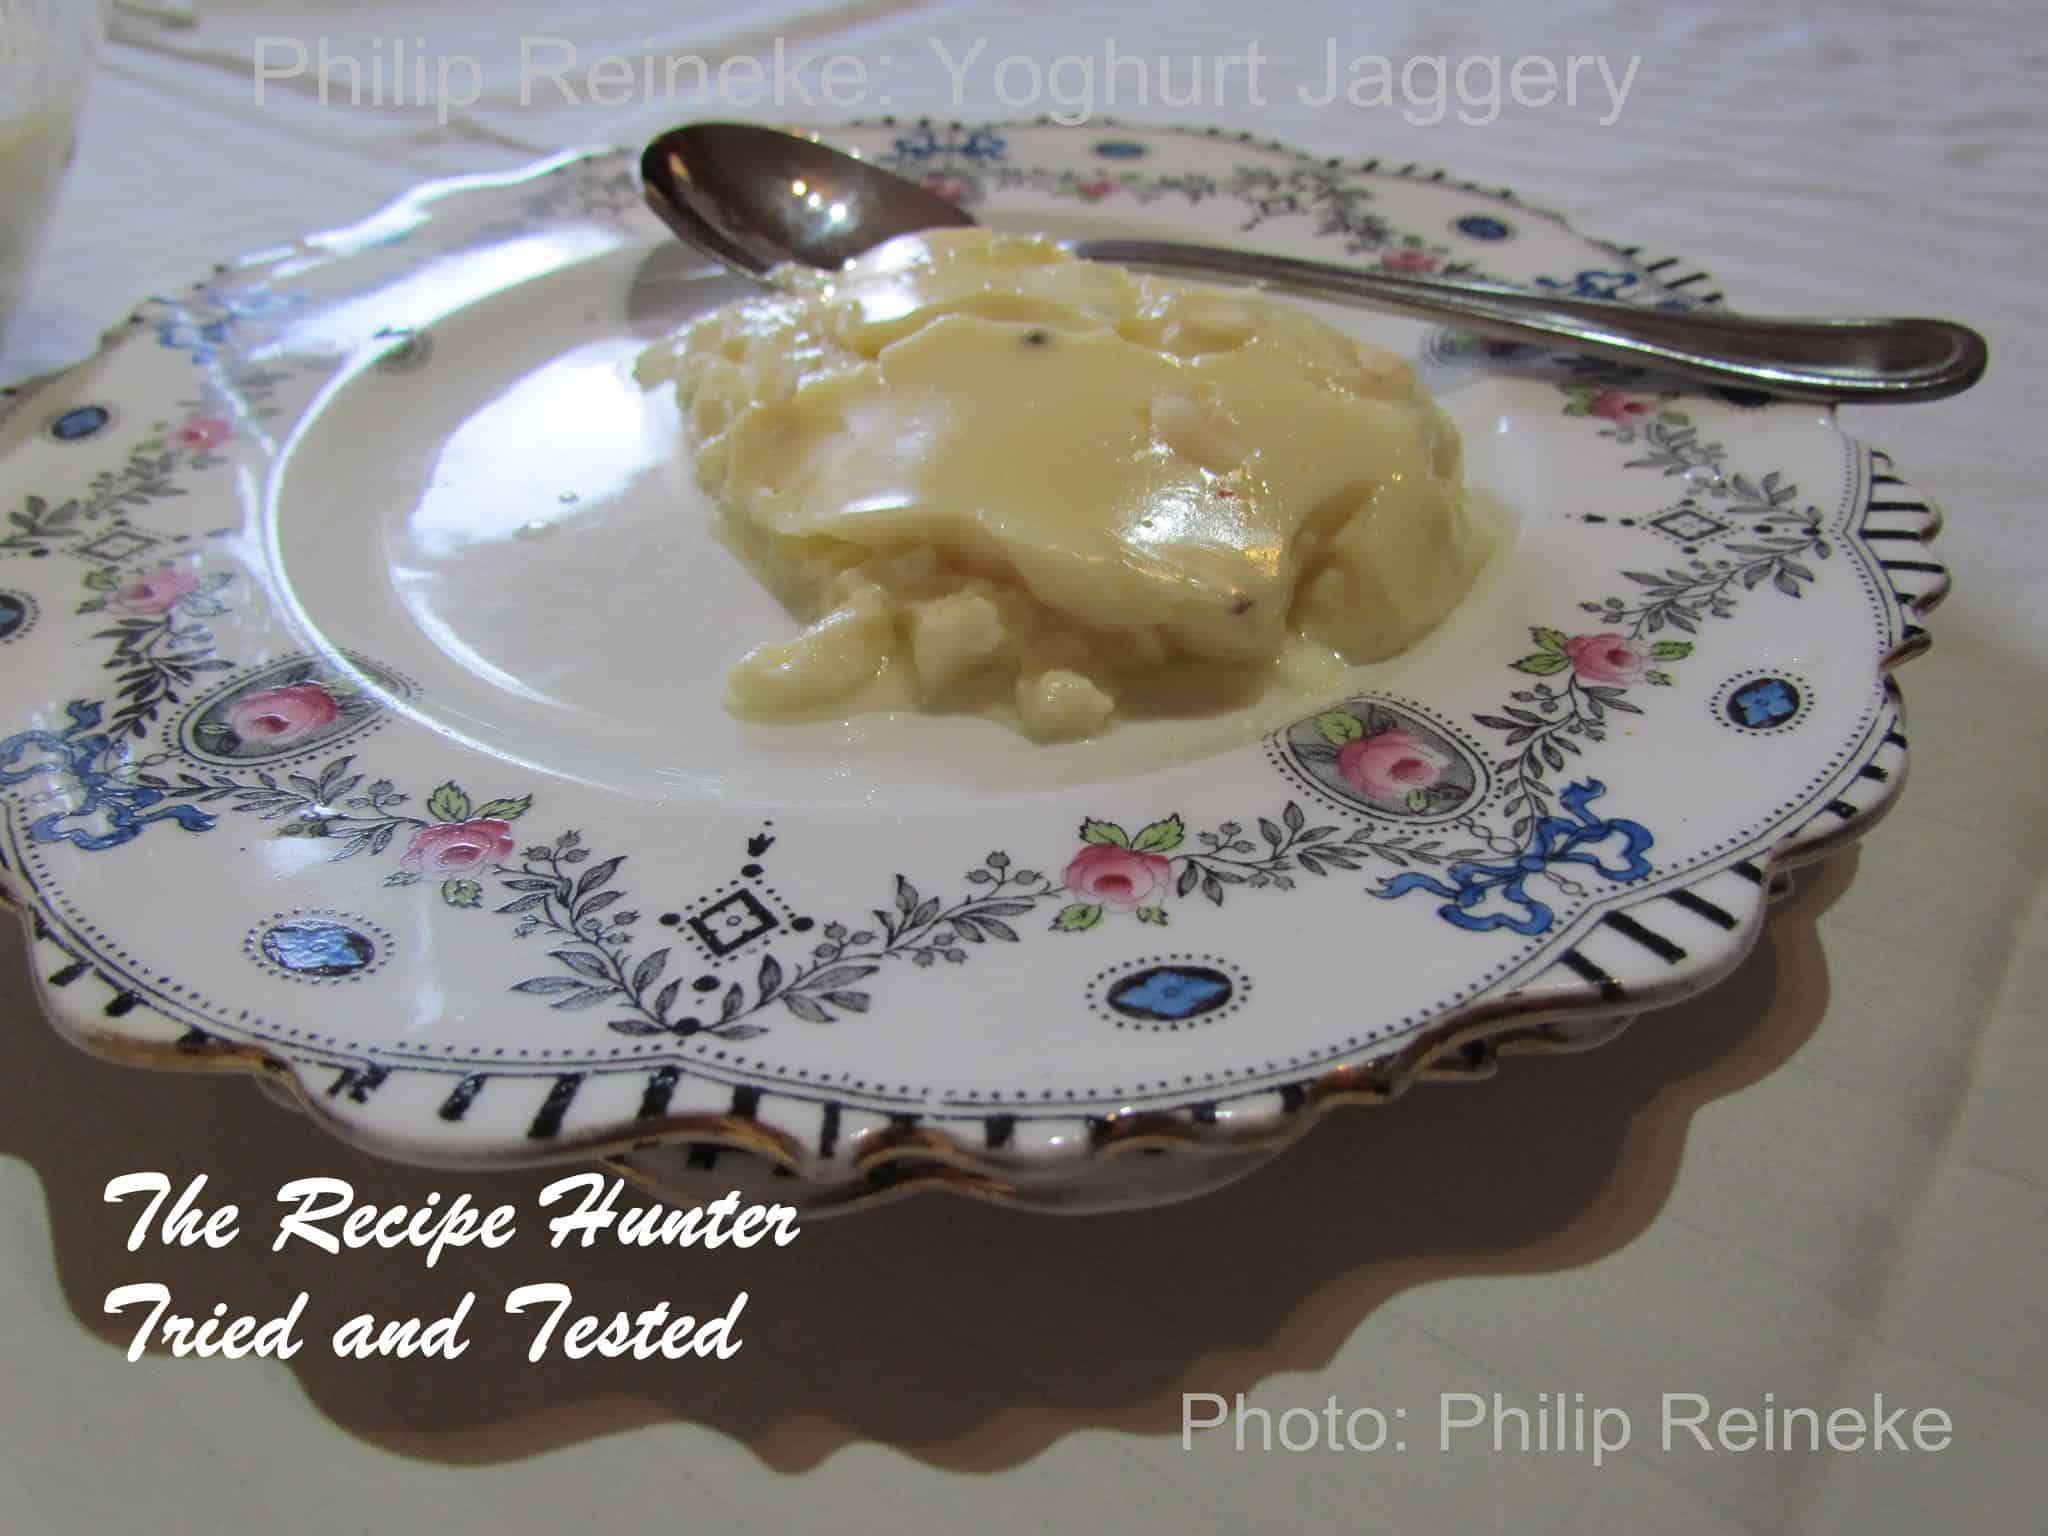 TRH Phillip's Yoghurt jaggery - dessert